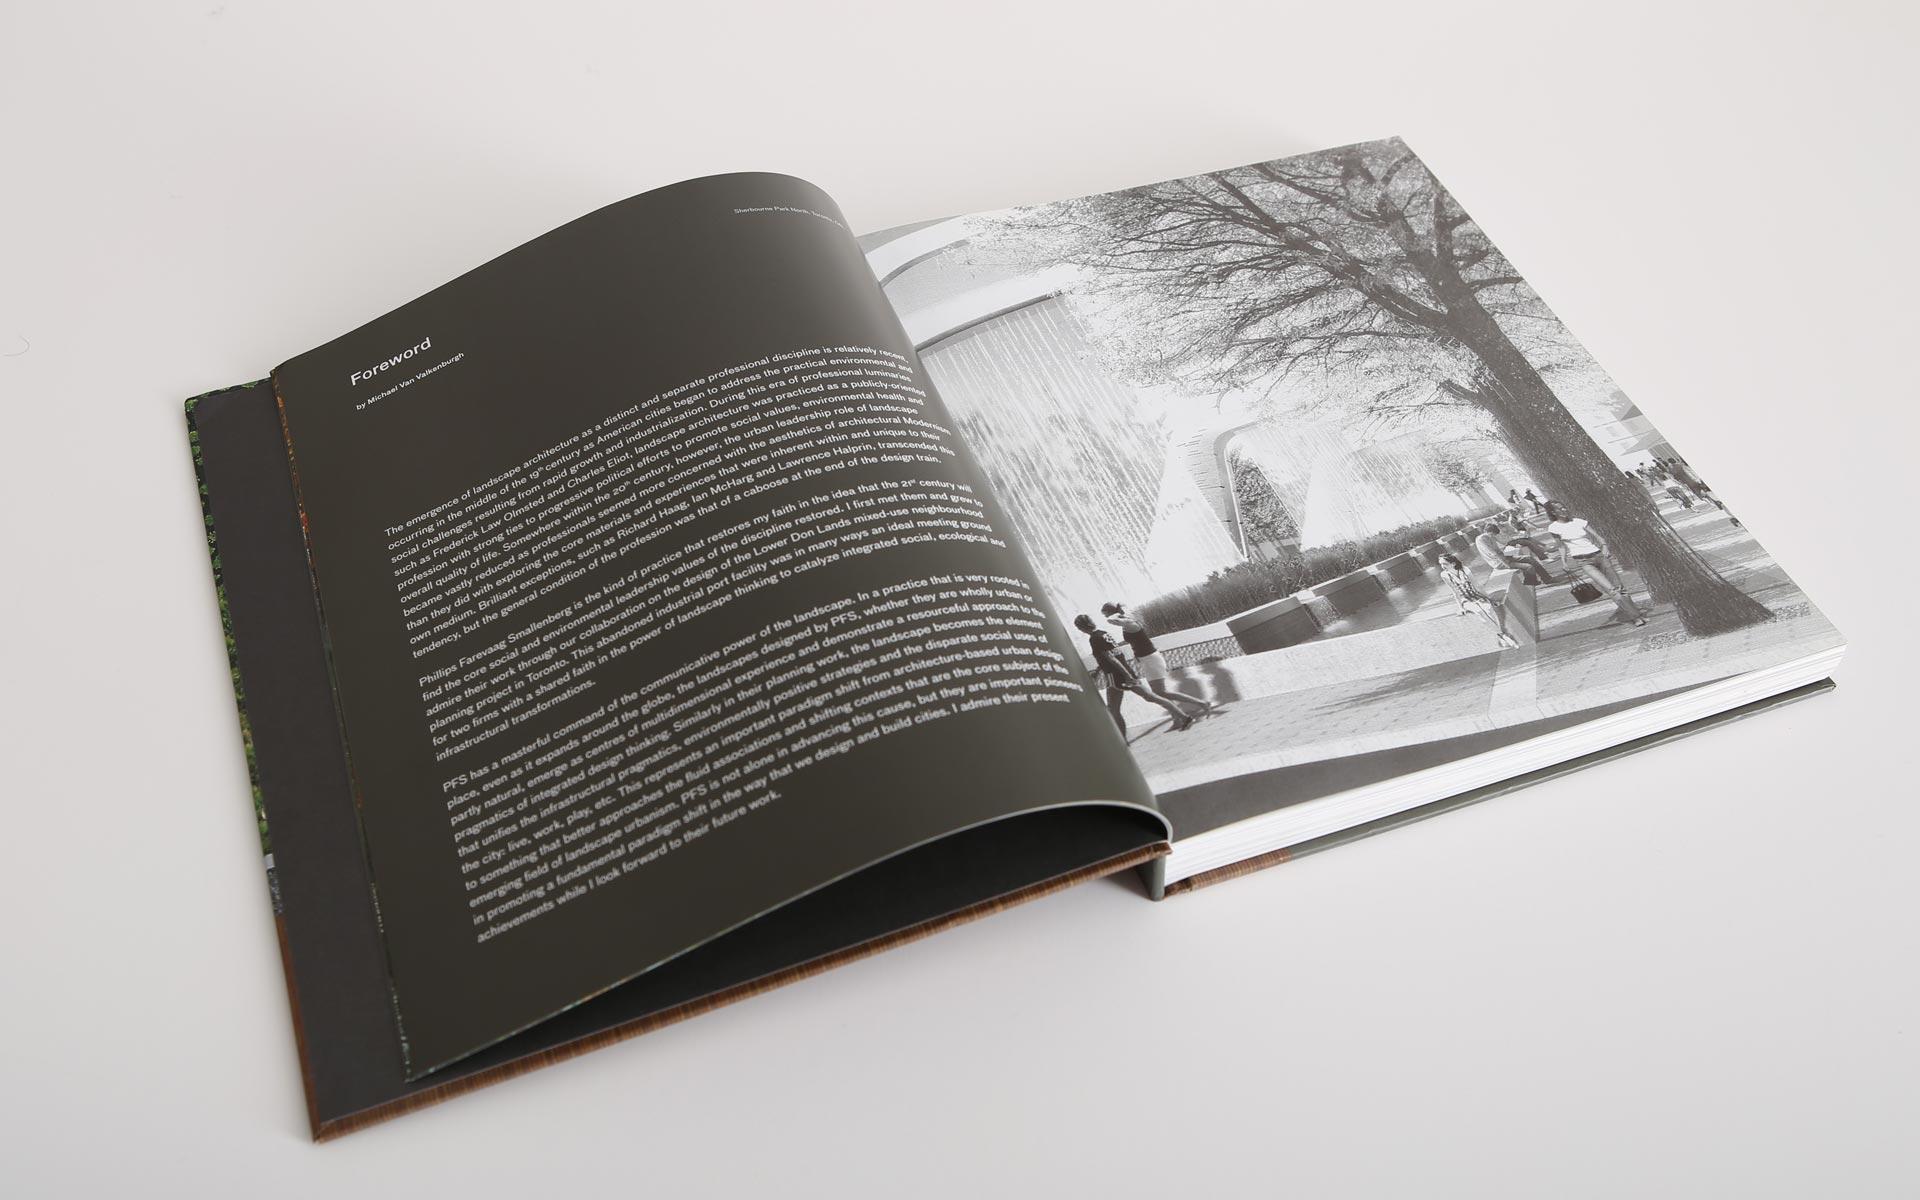 pfs-landscape-architects-book-design-4